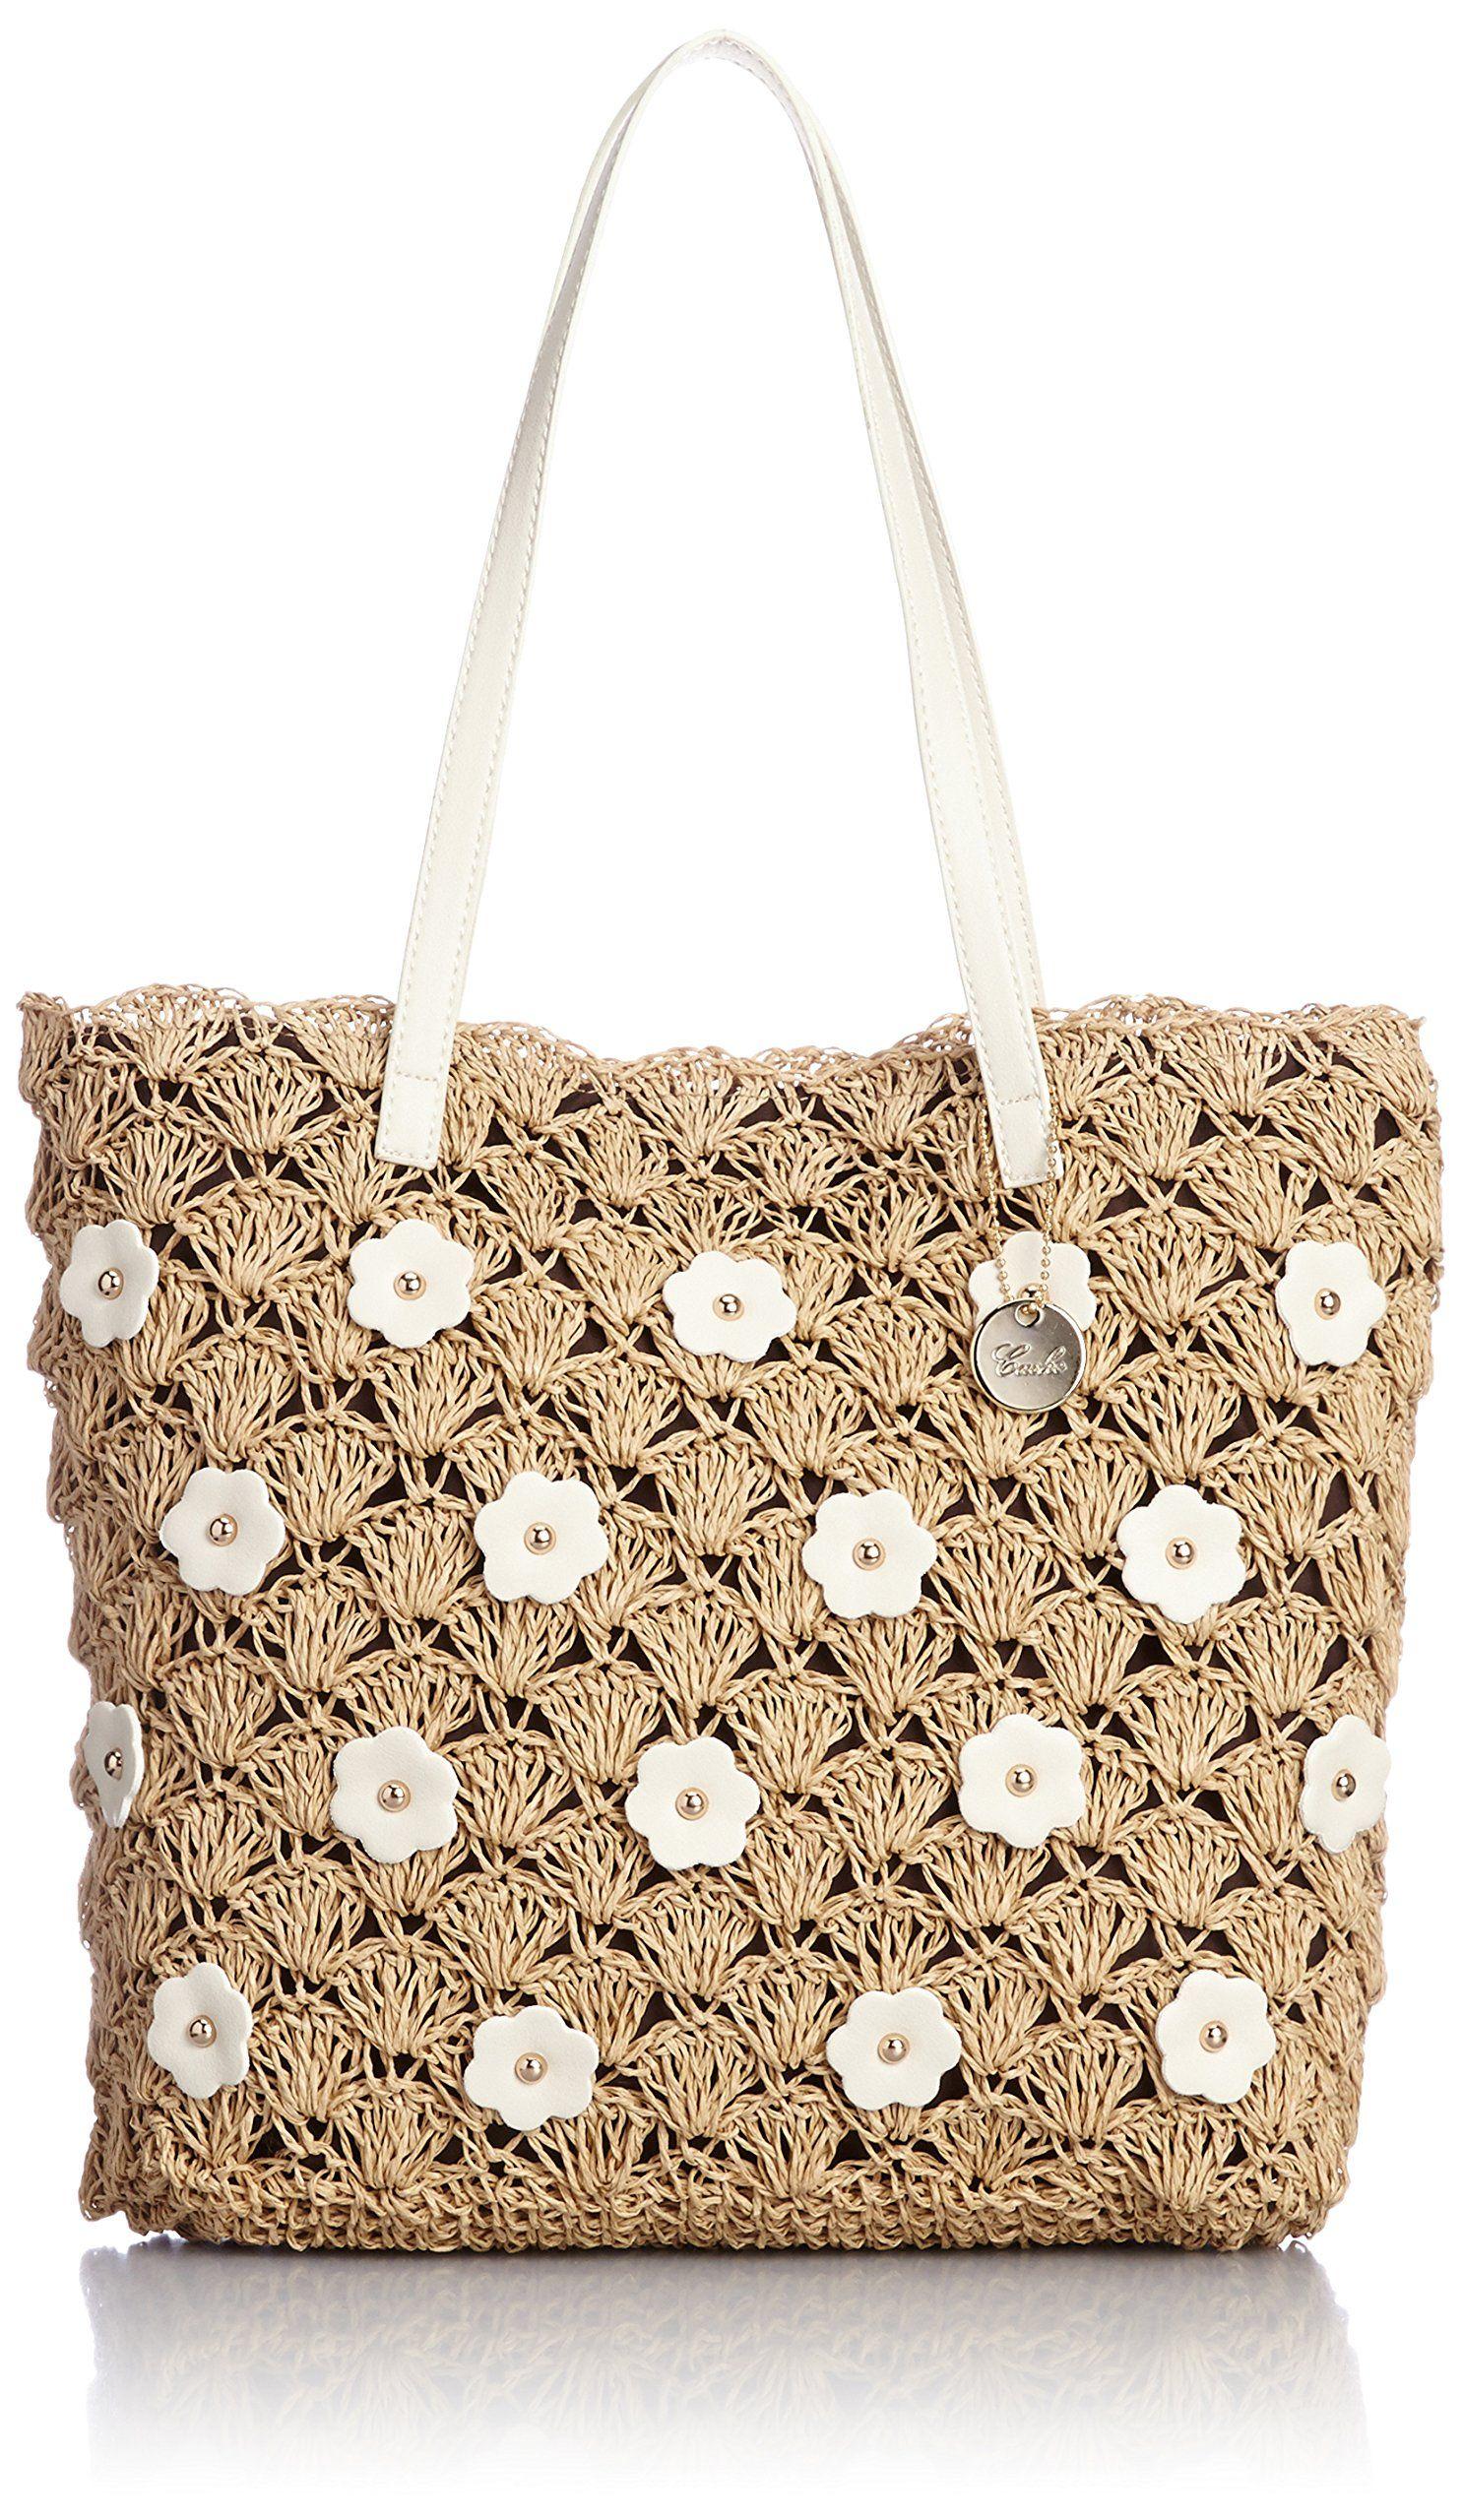 cache cache crochet bag | -::- Crochet bags & purses ...